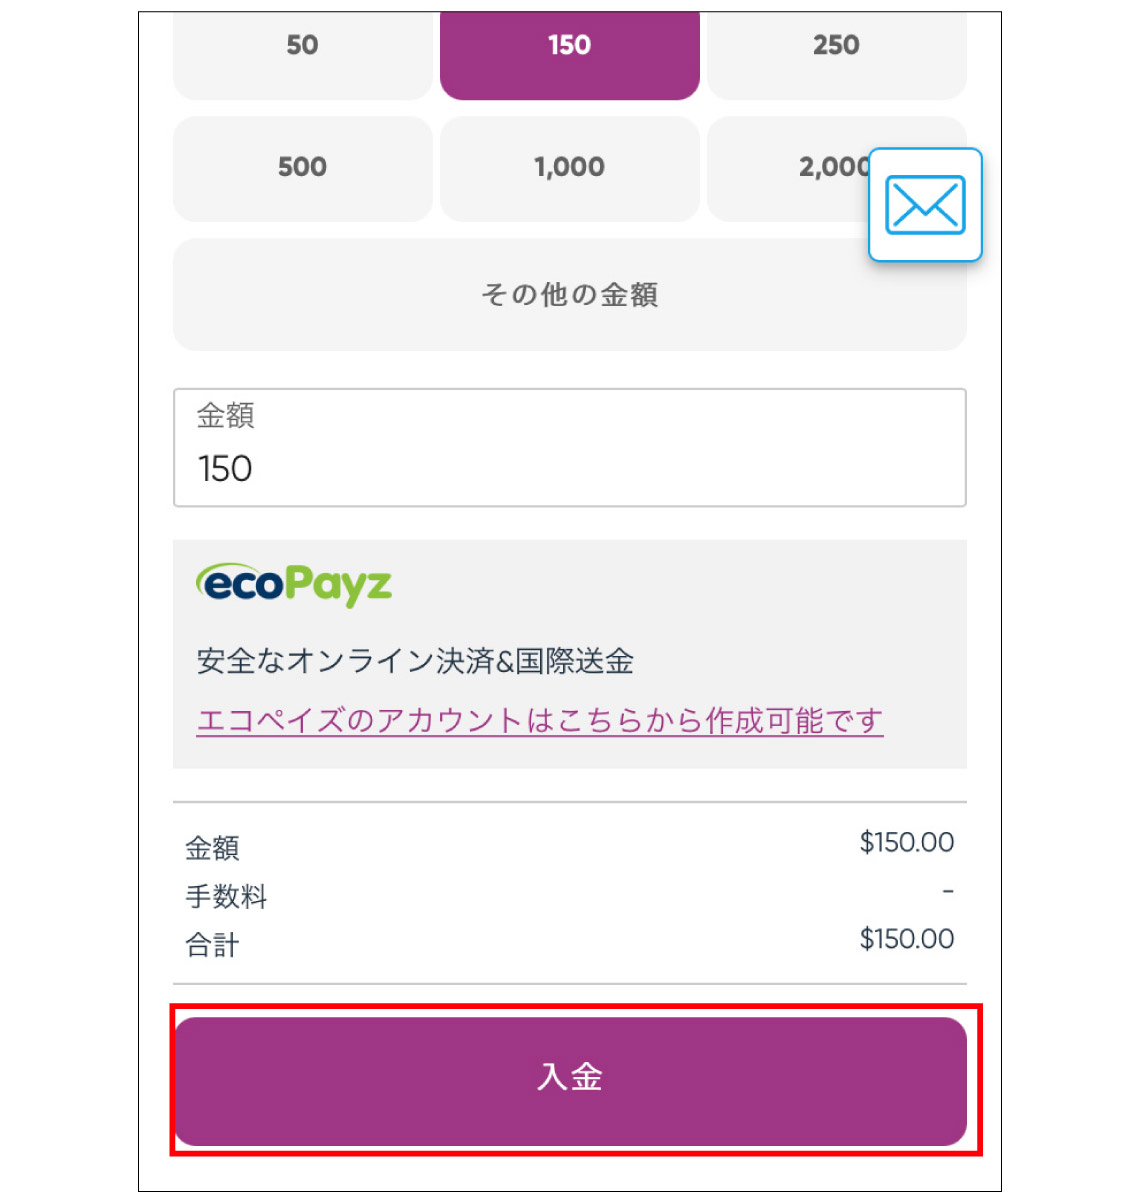 ecoPayzを使ってカジノシークレットへの入金方法